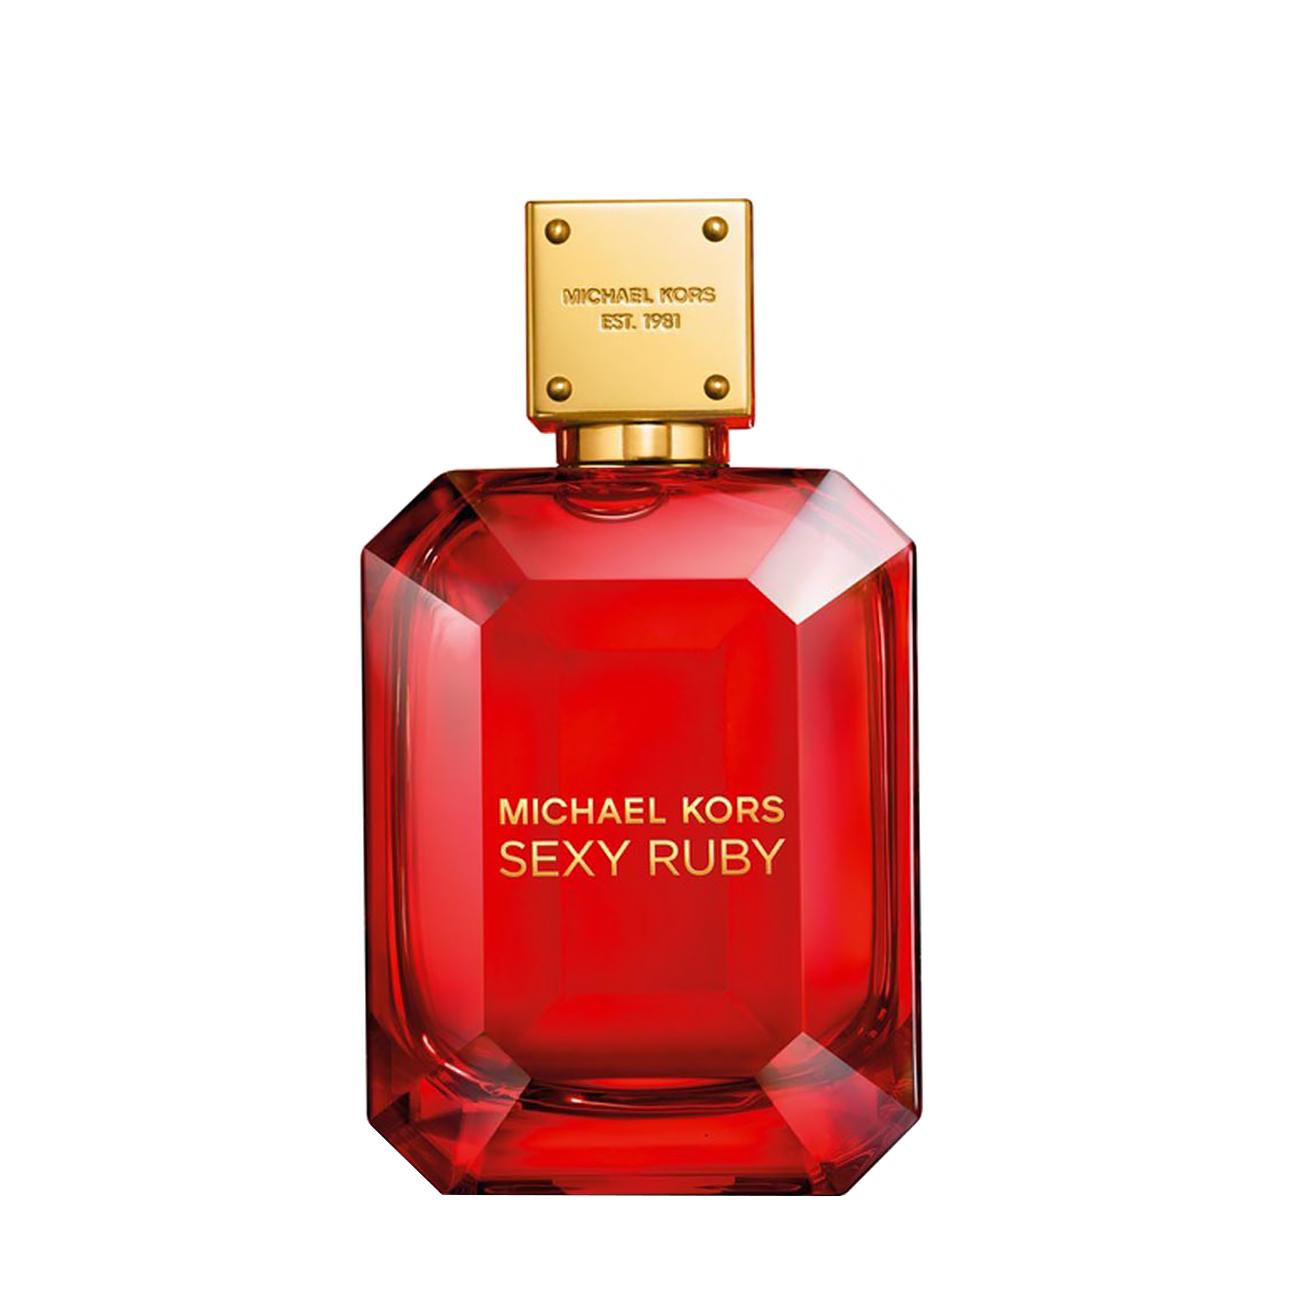 Sexy Ruby 100ml Michael Kors imagine 2021 bestvalue.eu